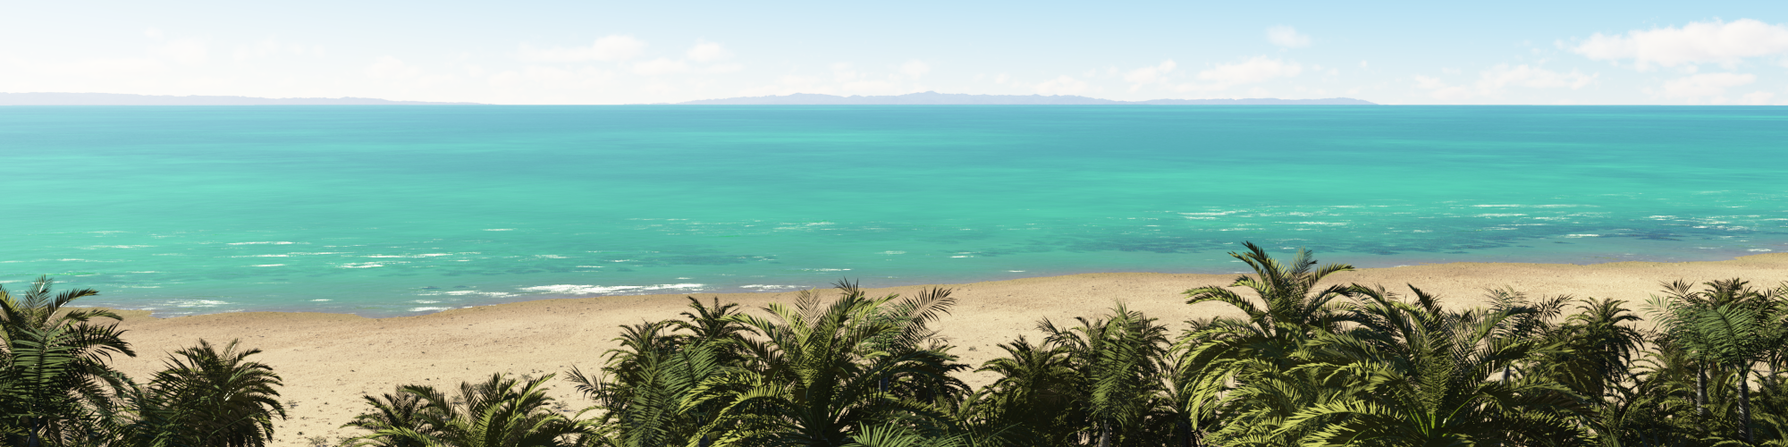 Tropical by Gannaingh32